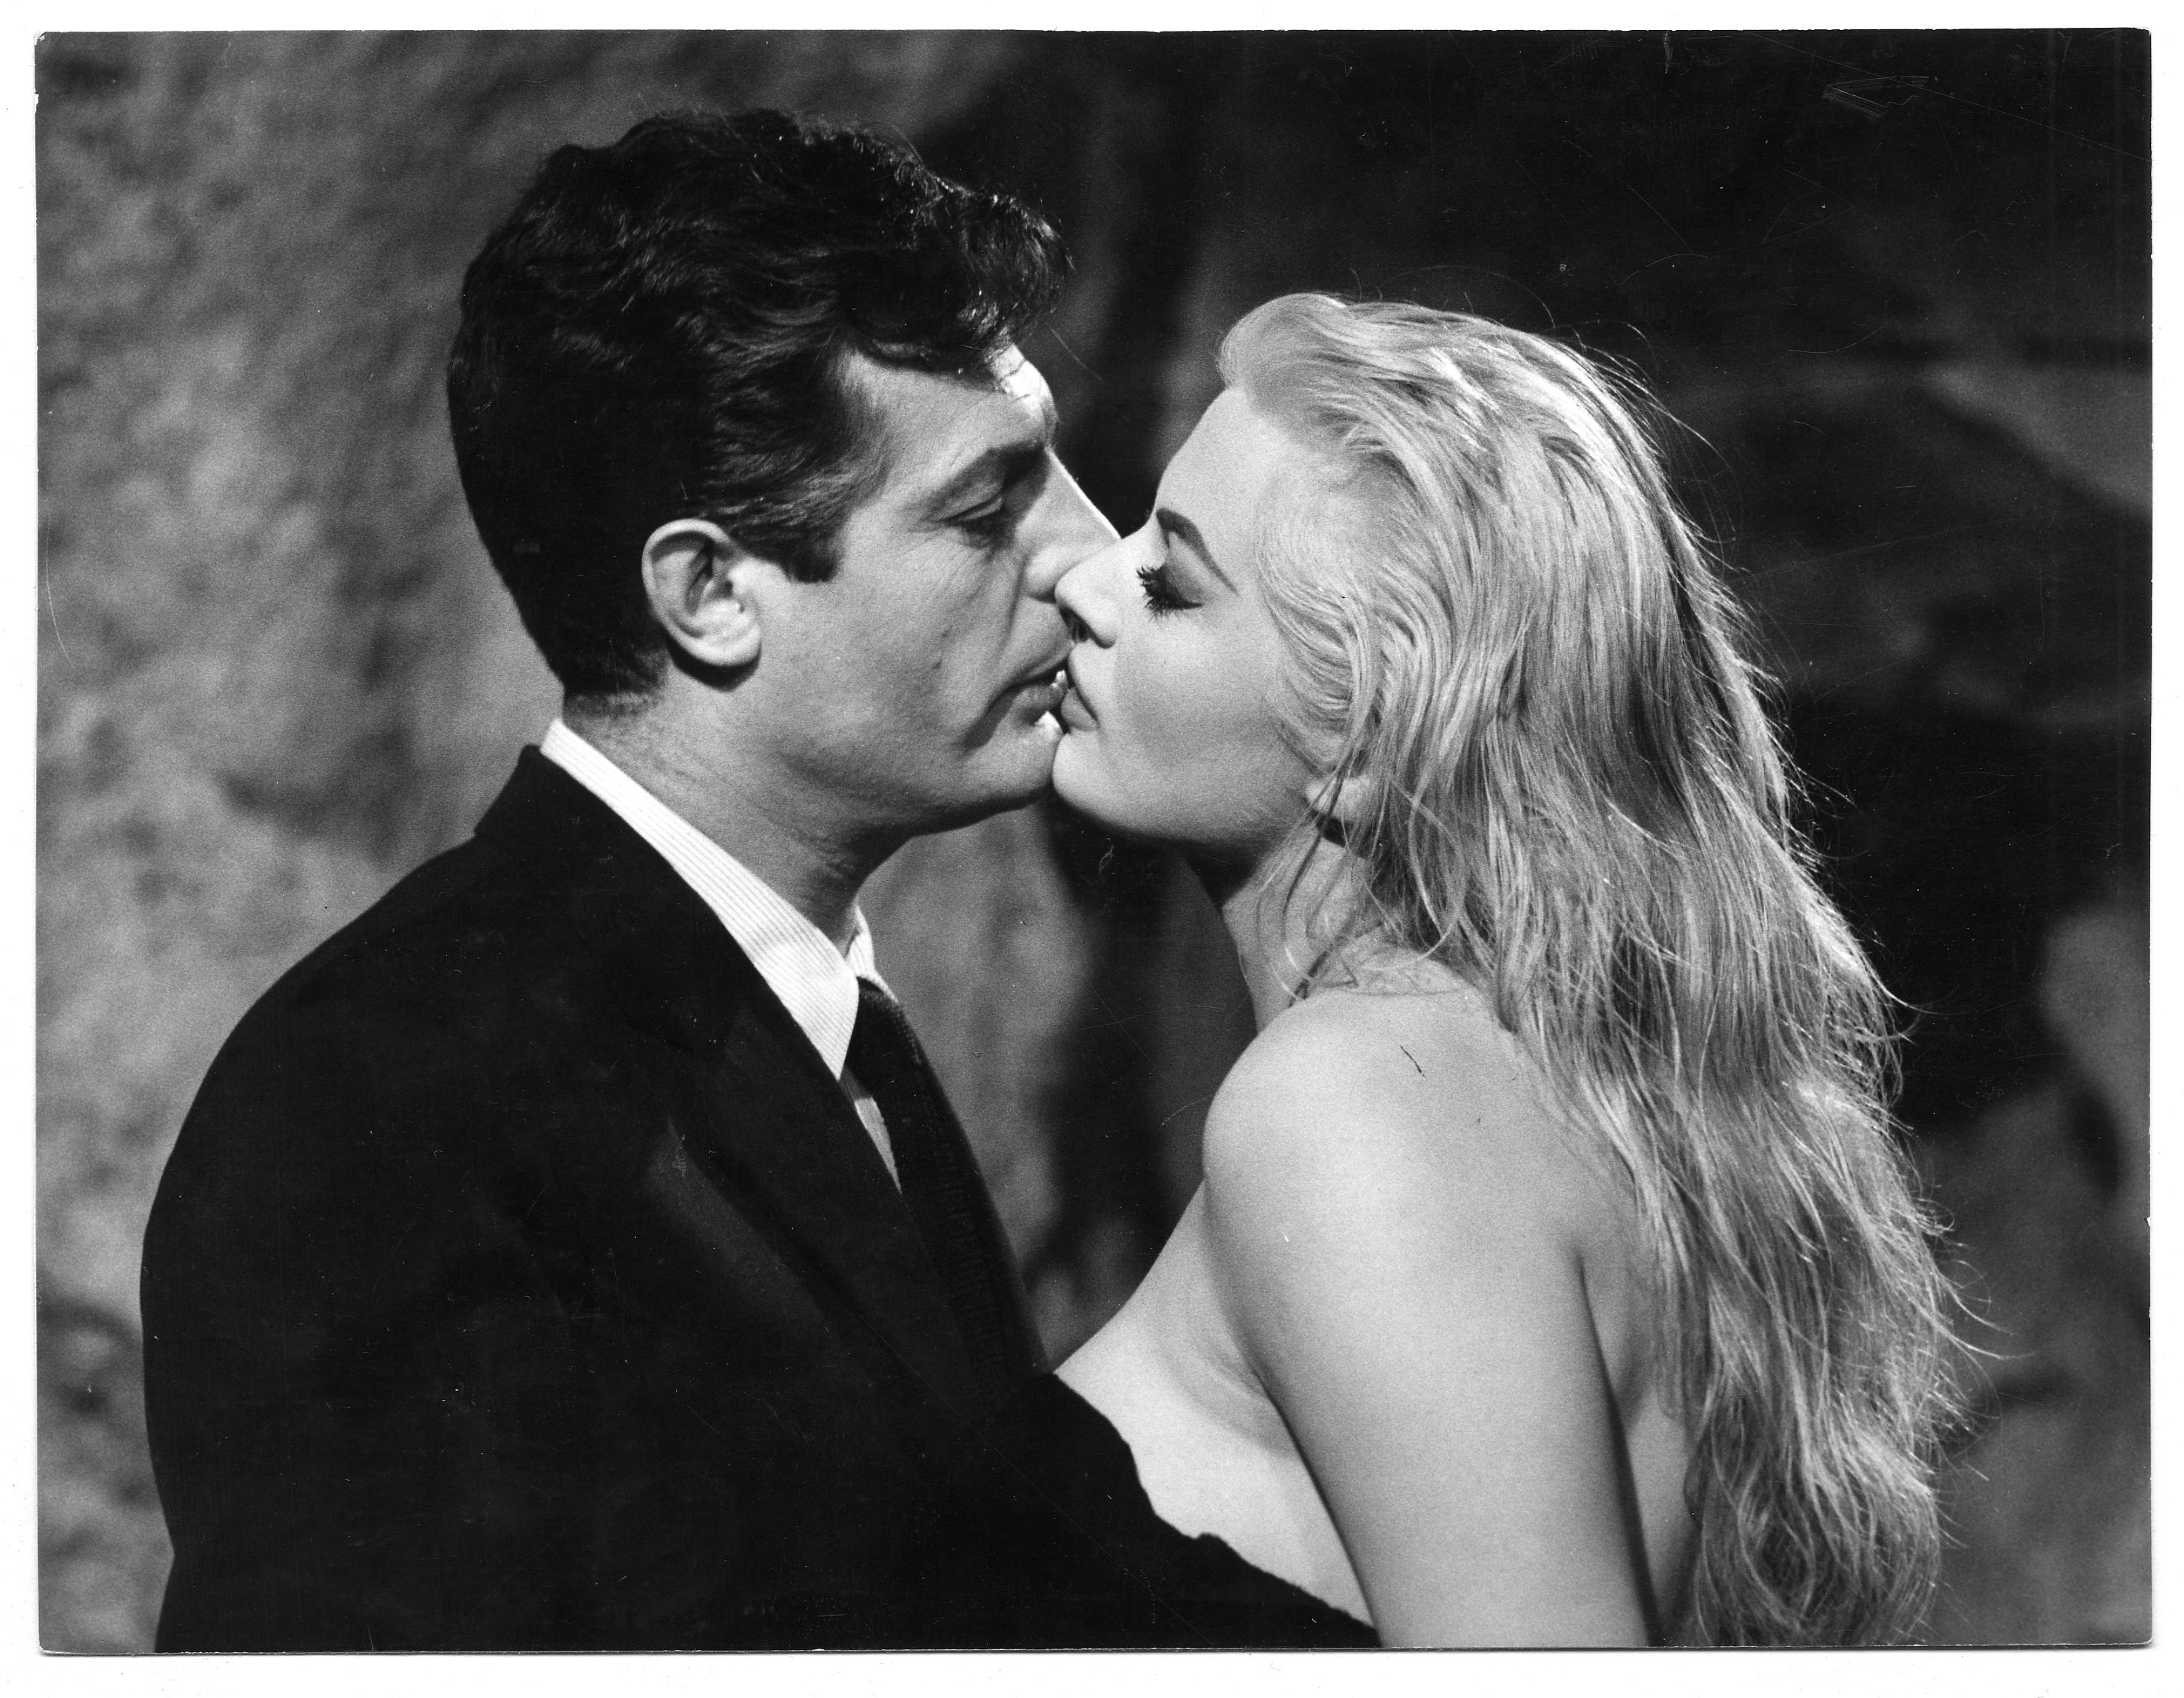 """La Dolce Vita"" by Federico Fellini [1960] [2908x2261] ..."